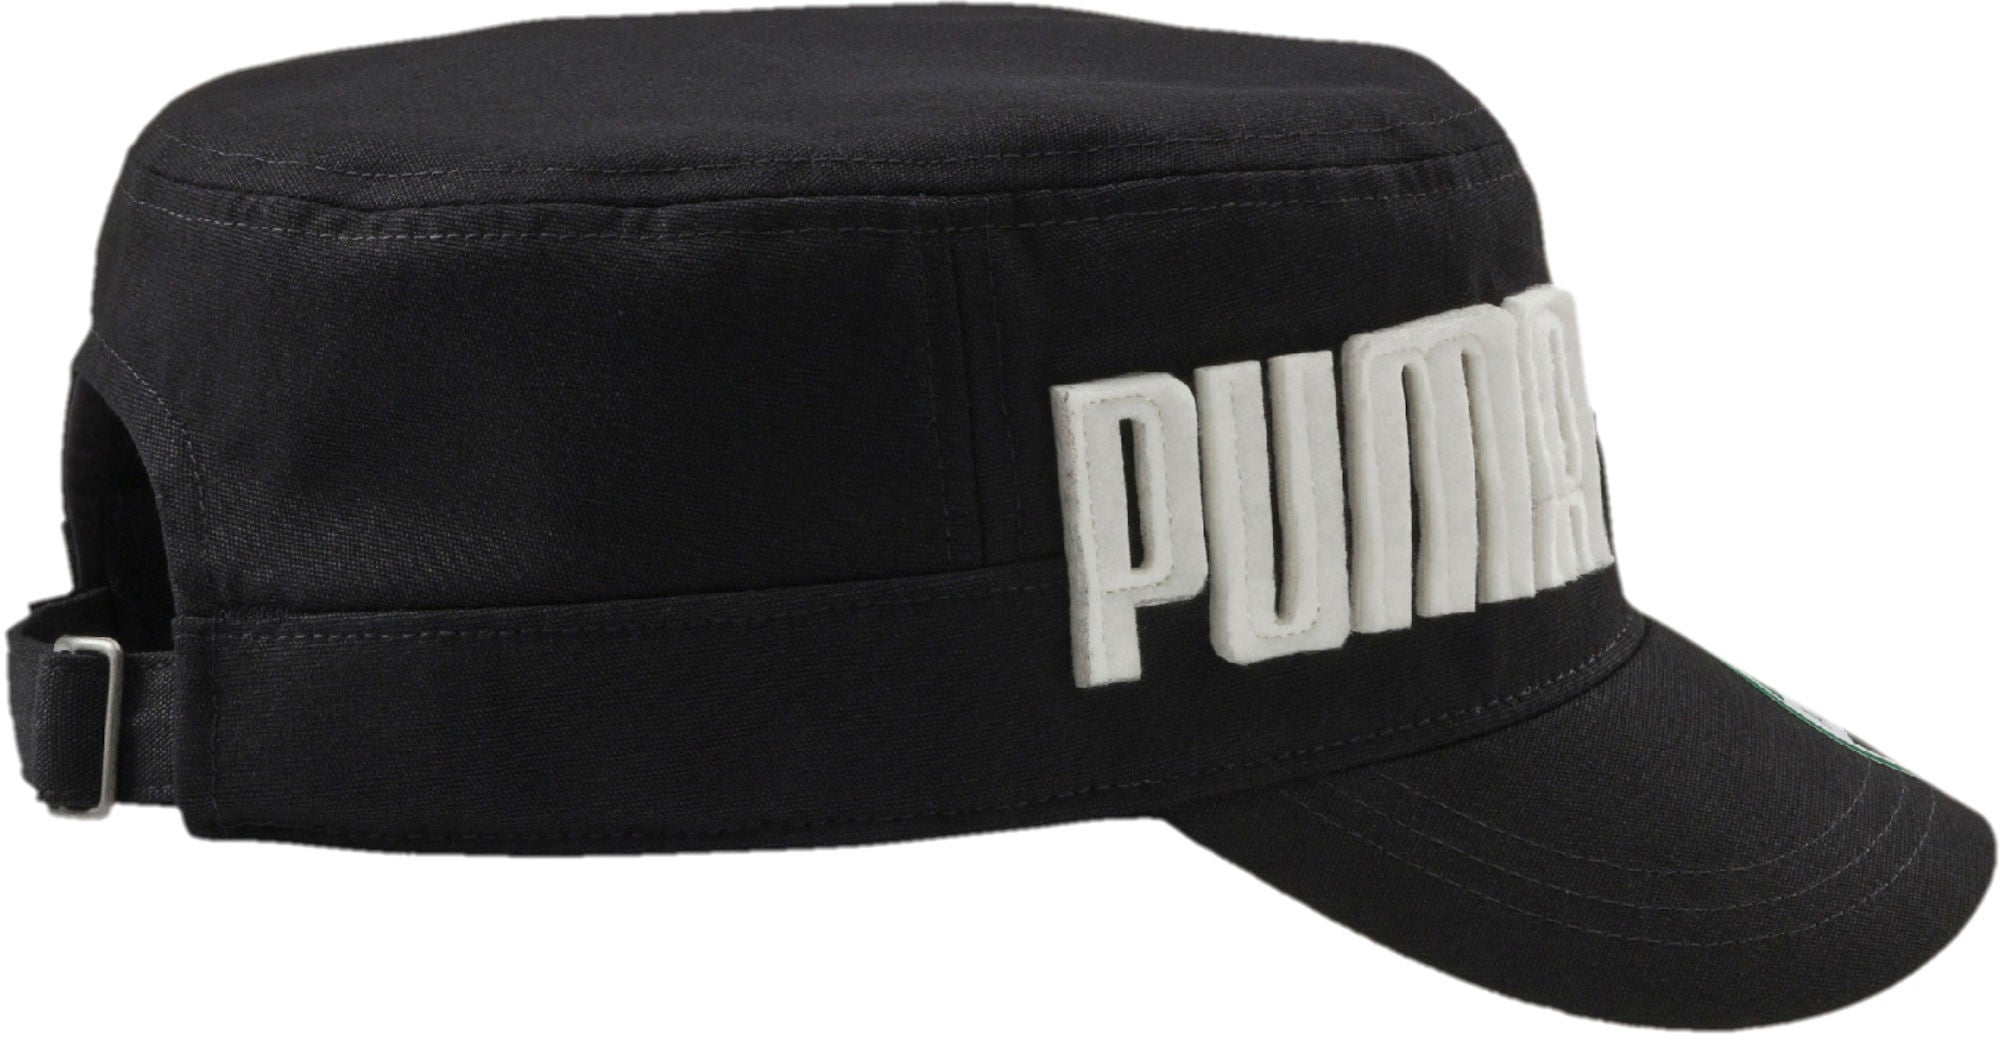 Osta Puma Penham Military Lippalakki  d091439436